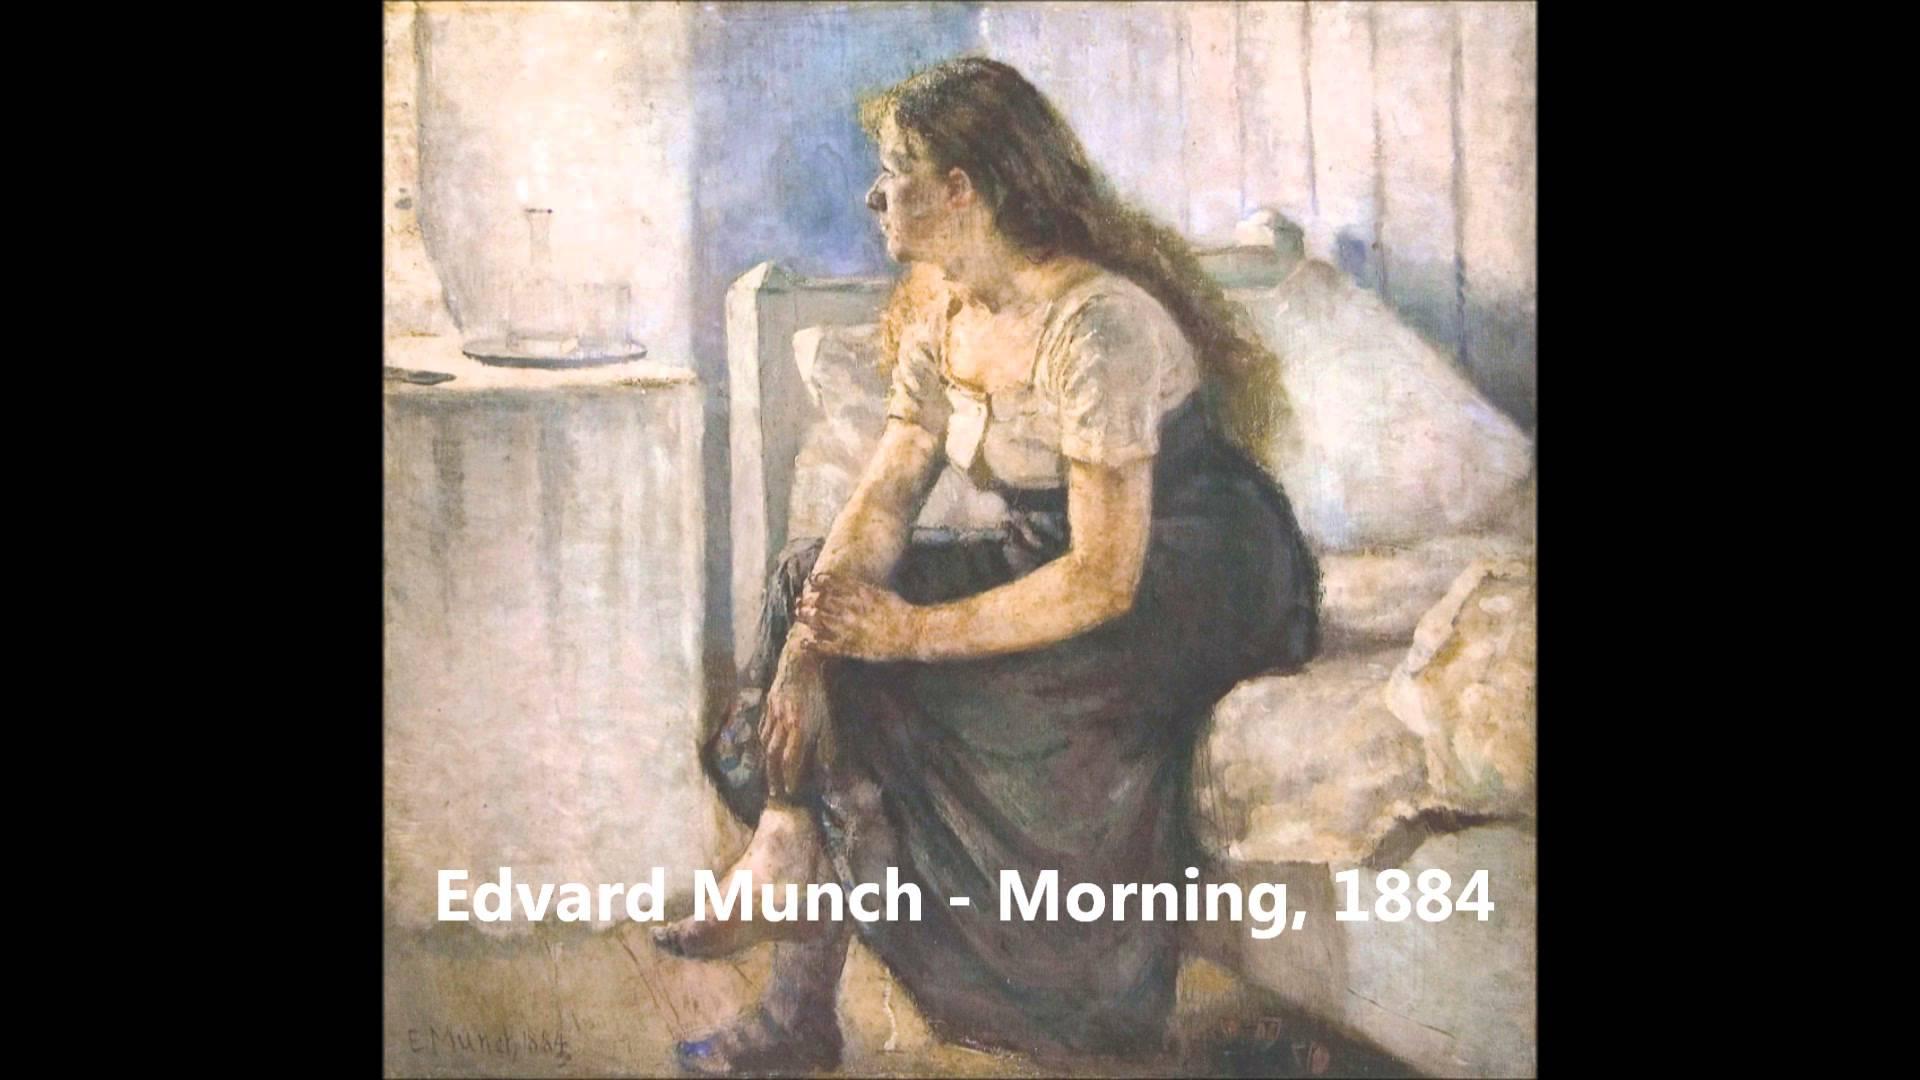 Morning (Munch)